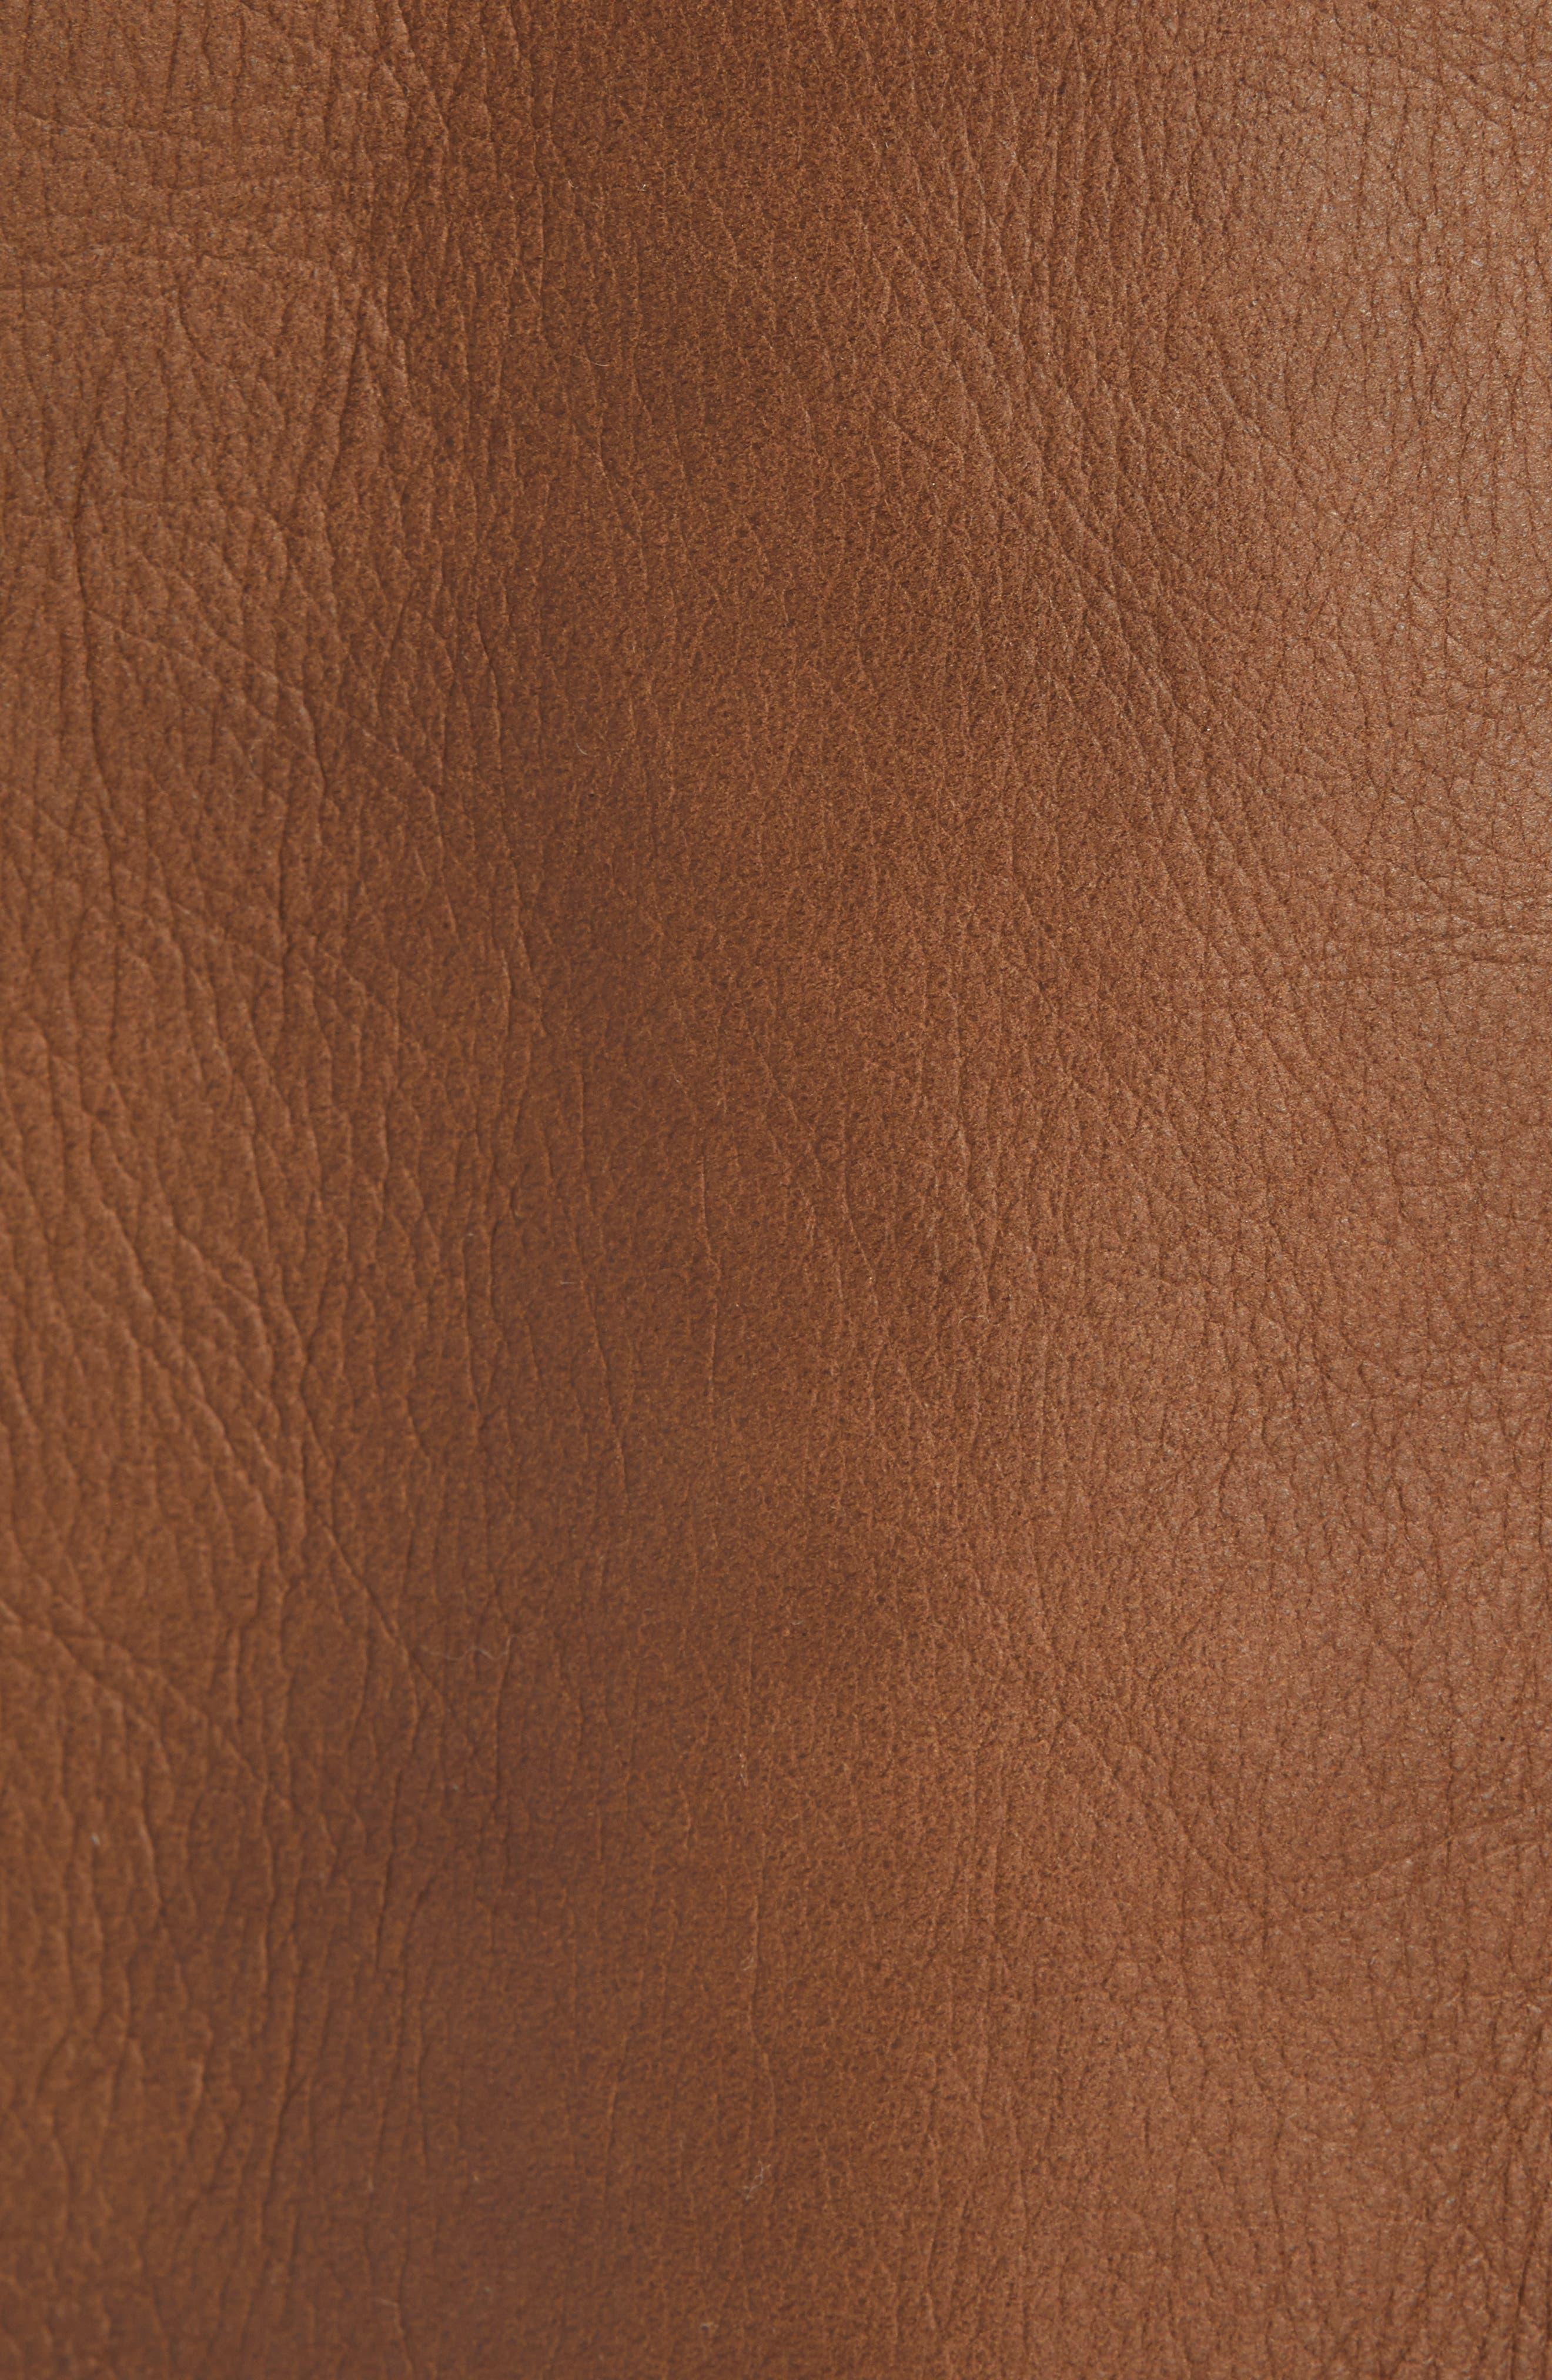 Reversible Genuine Shearling Jacket,                             Alternate thumbnail 7, color,                             117